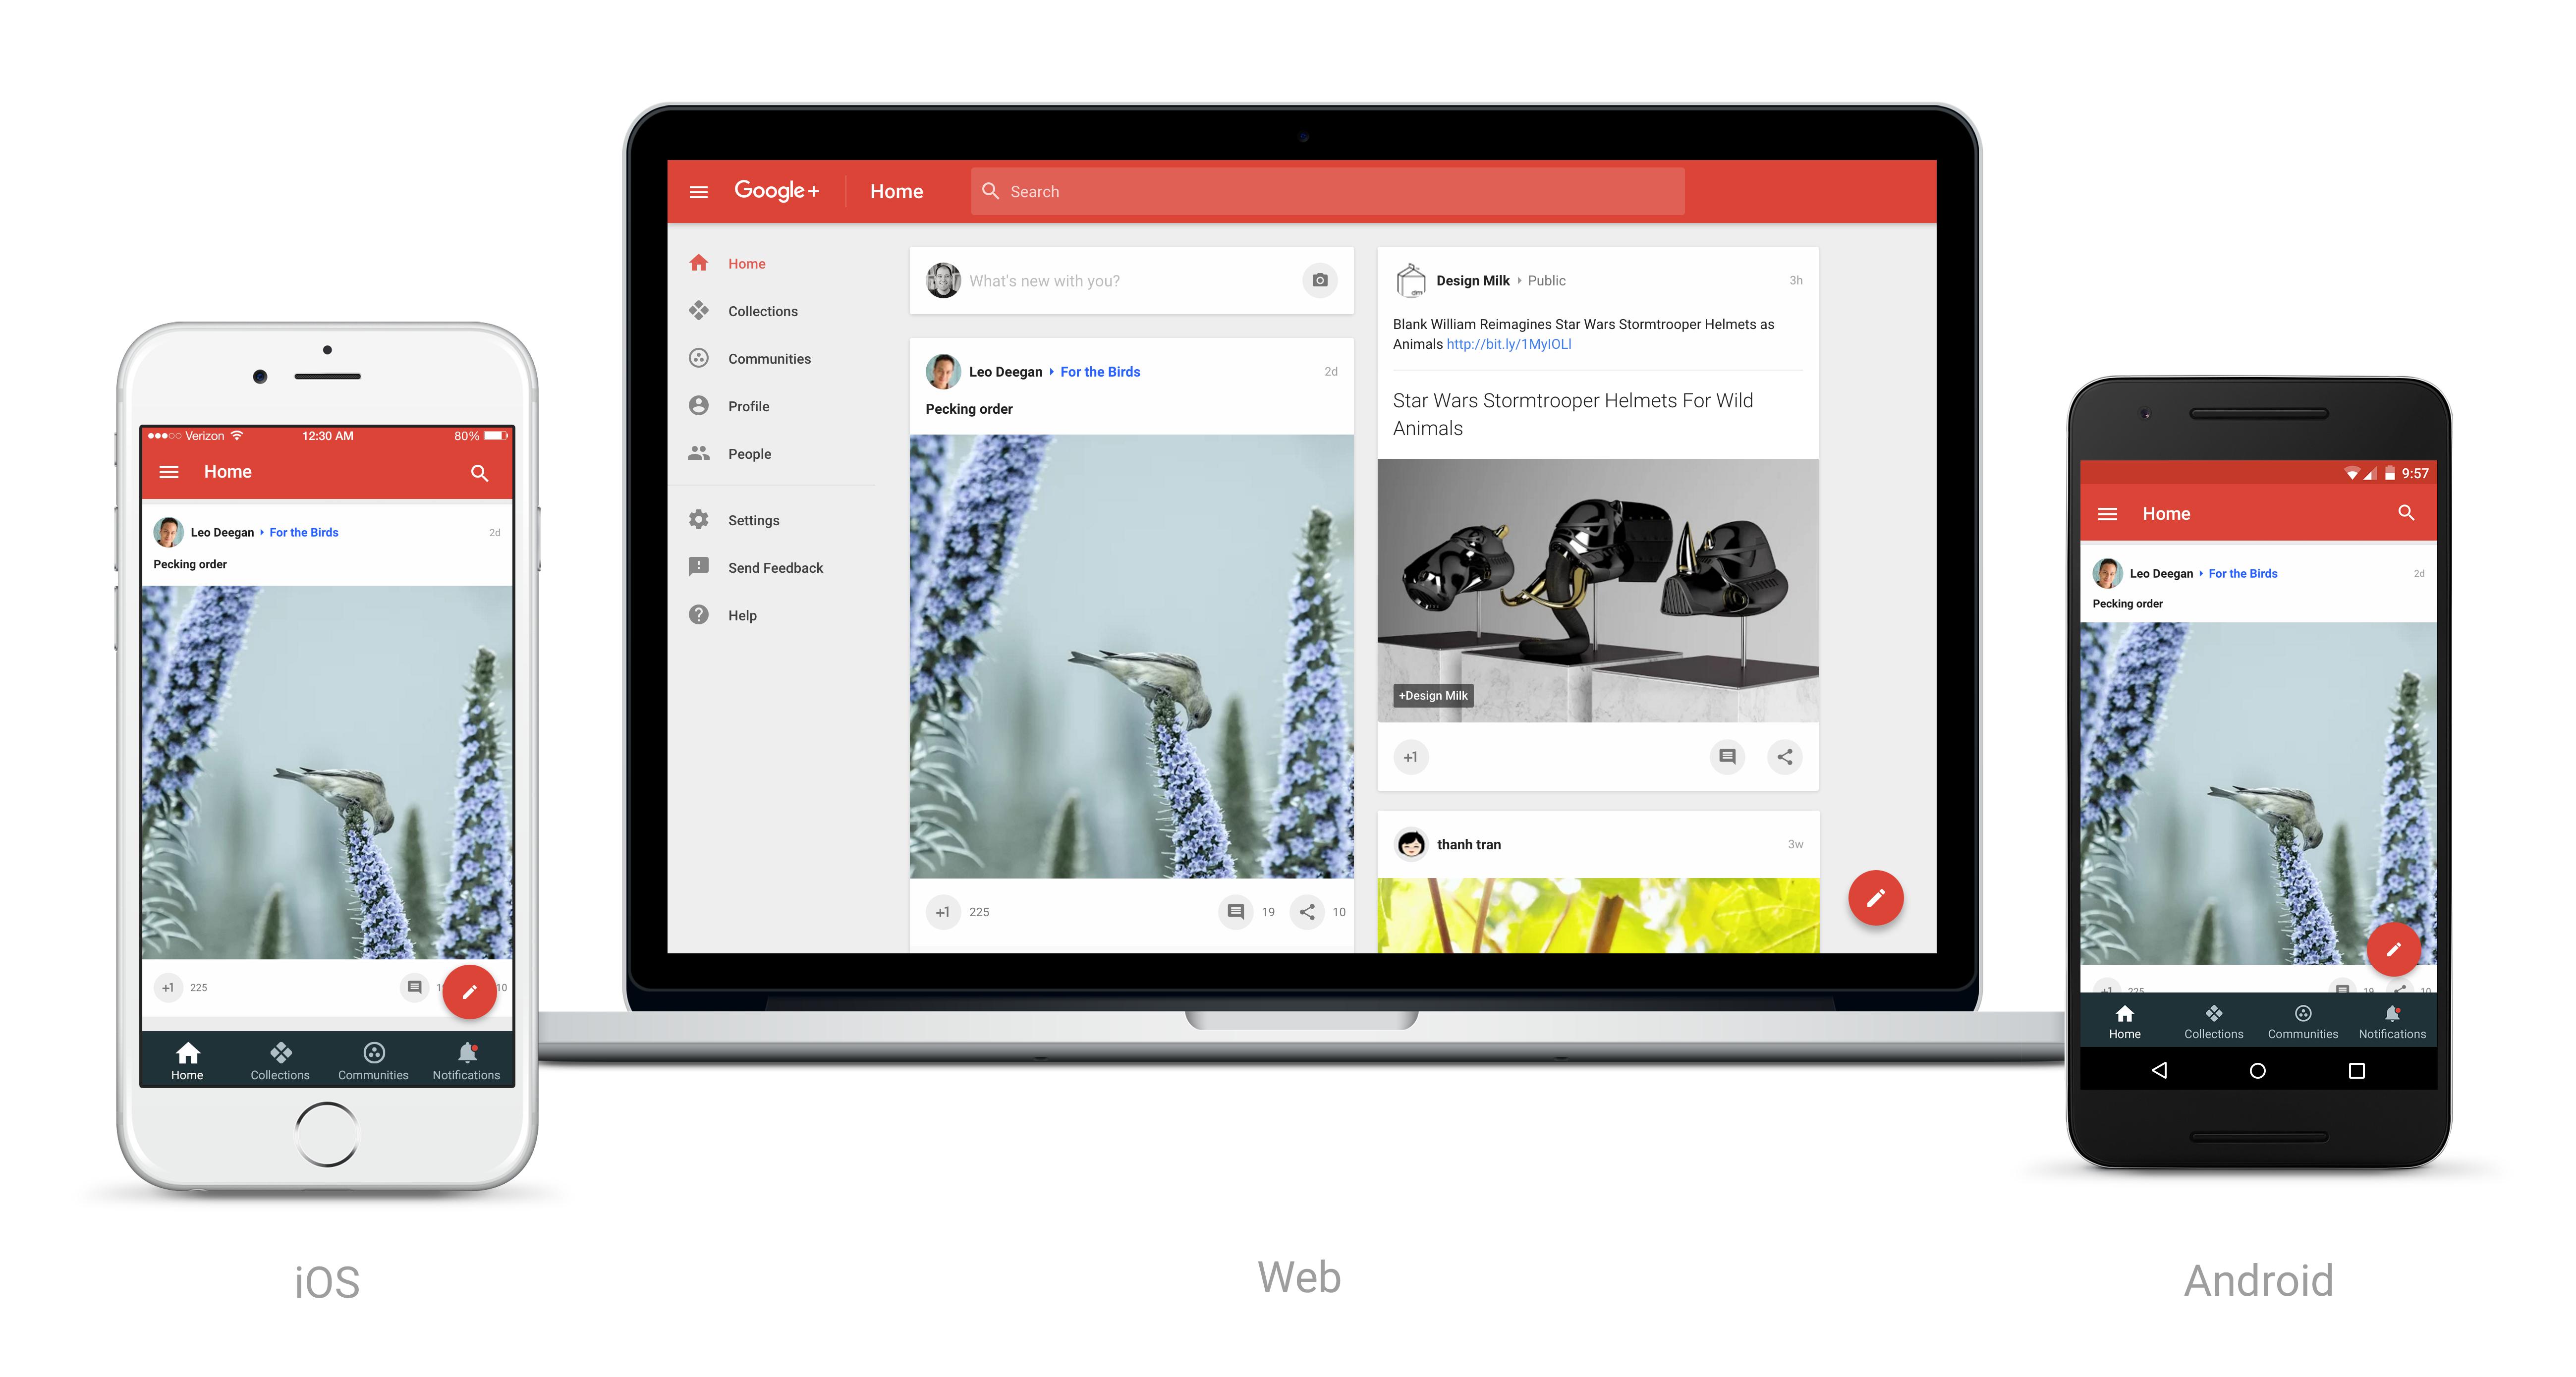 Behind The +1: Meet The New Google+(Plus)   TechCrunch